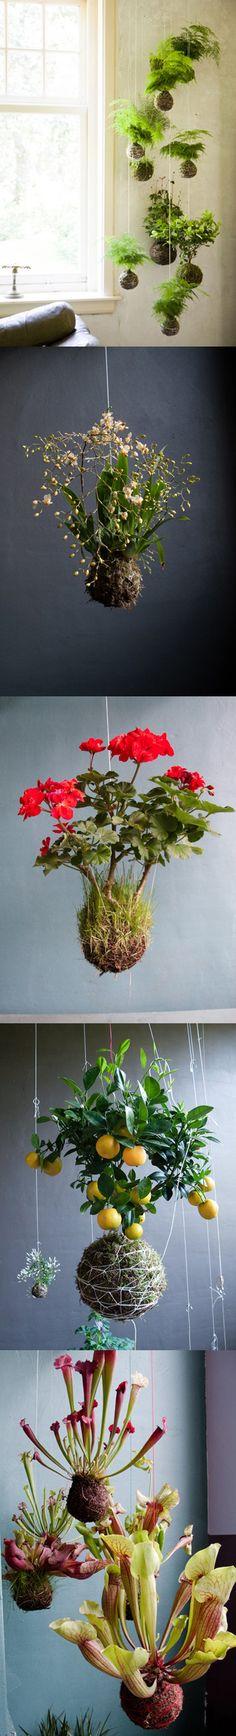 string-gardens-group